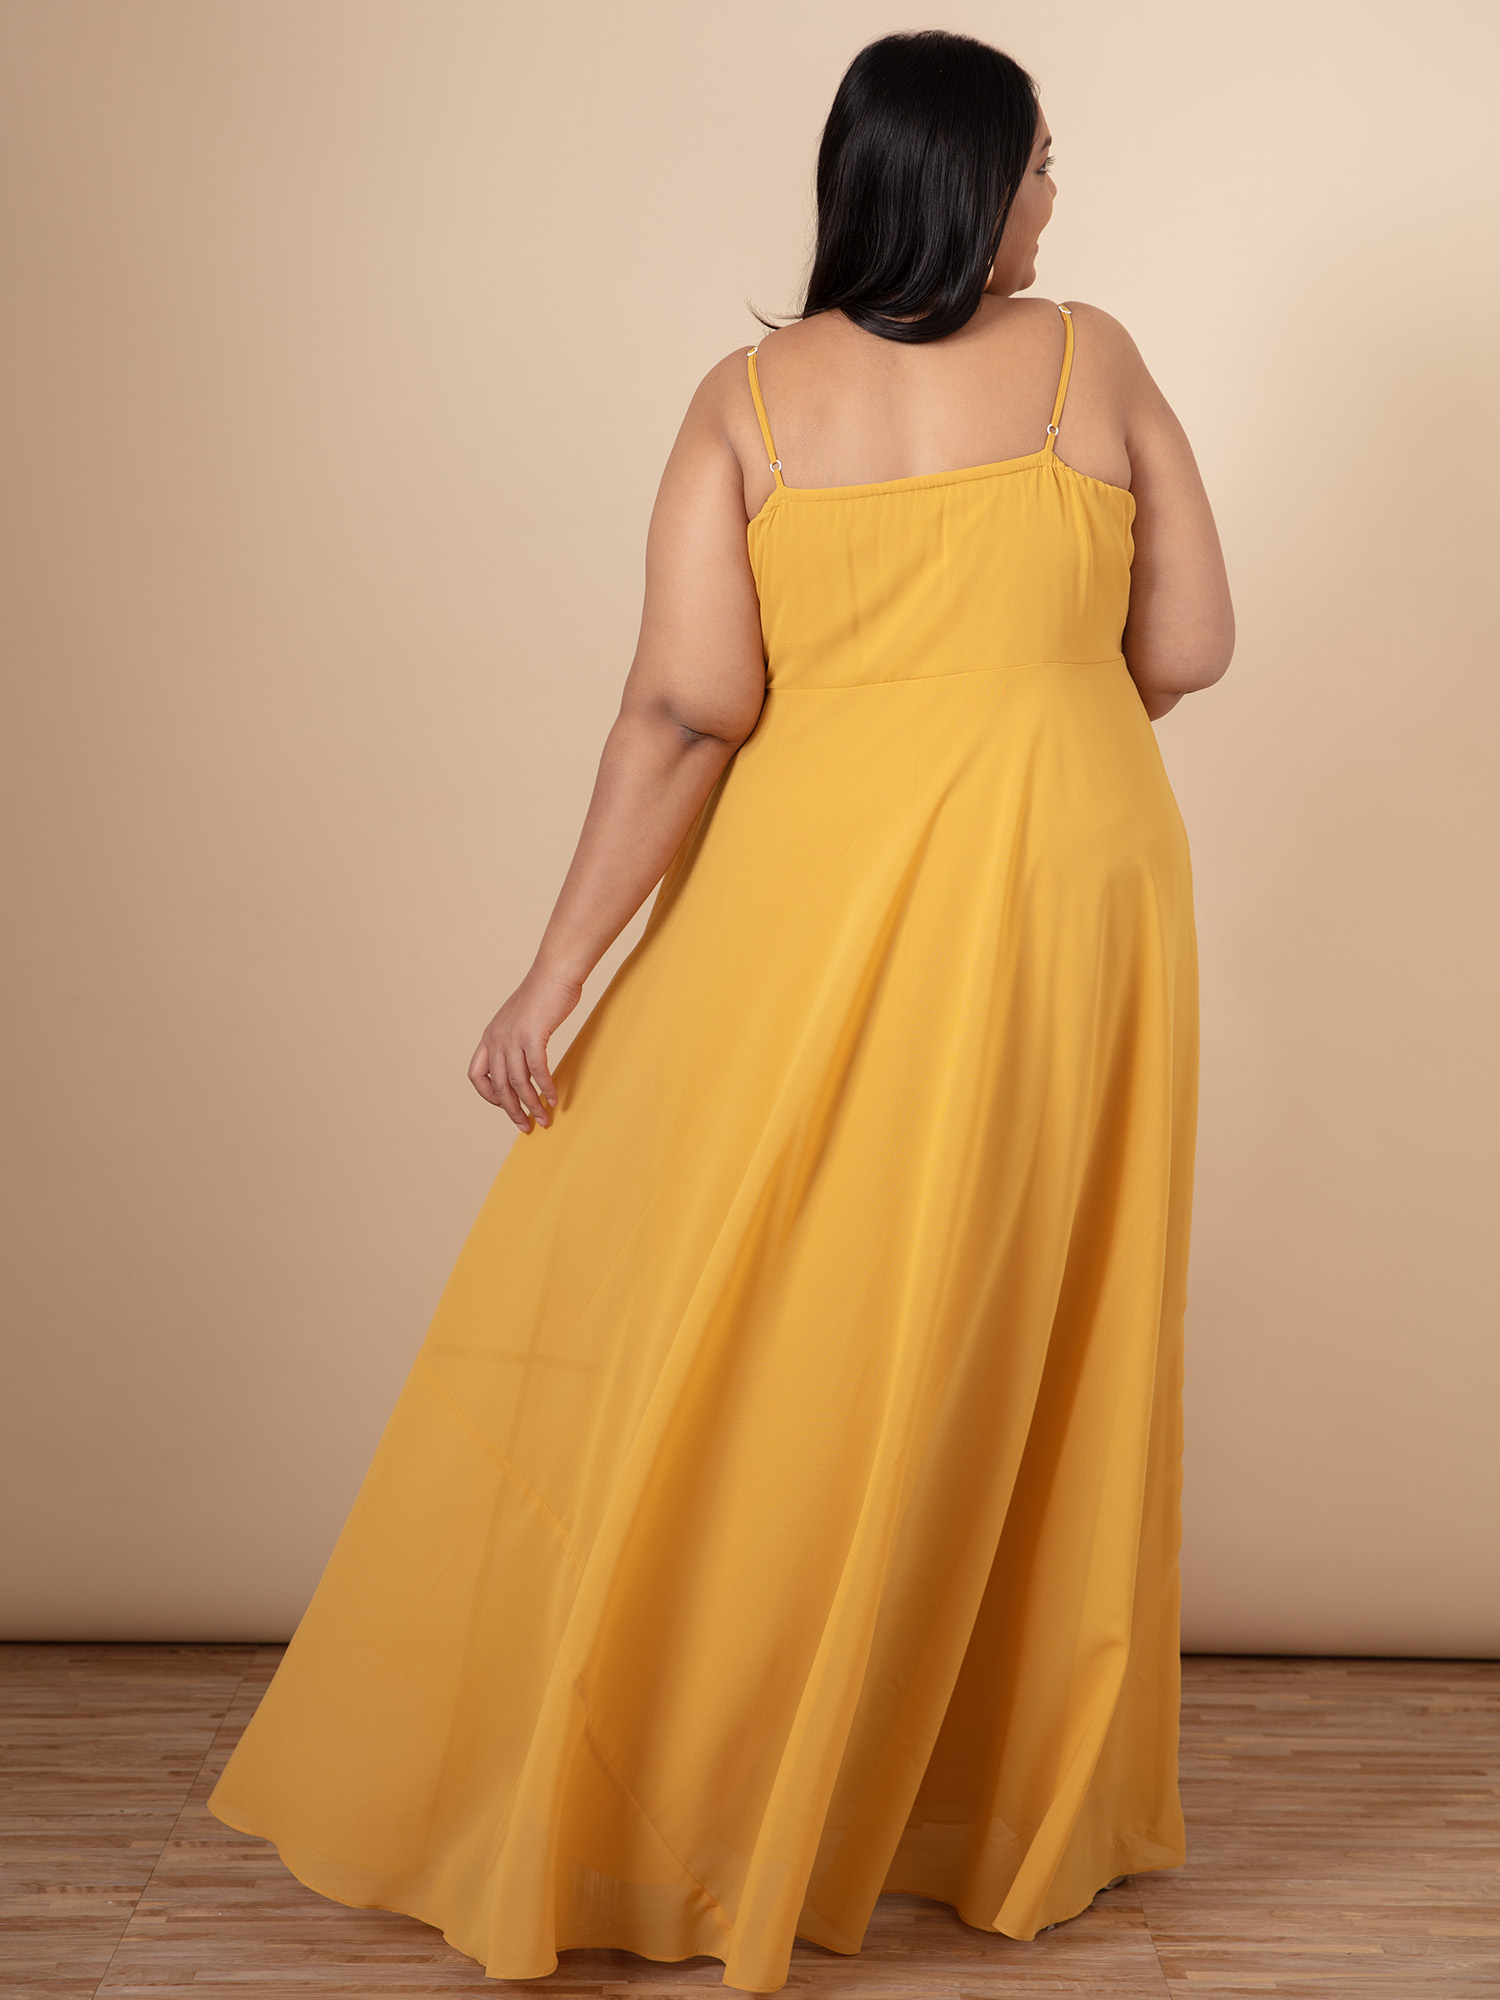 Dresses-Twirl Into The Season Maxi Dress3